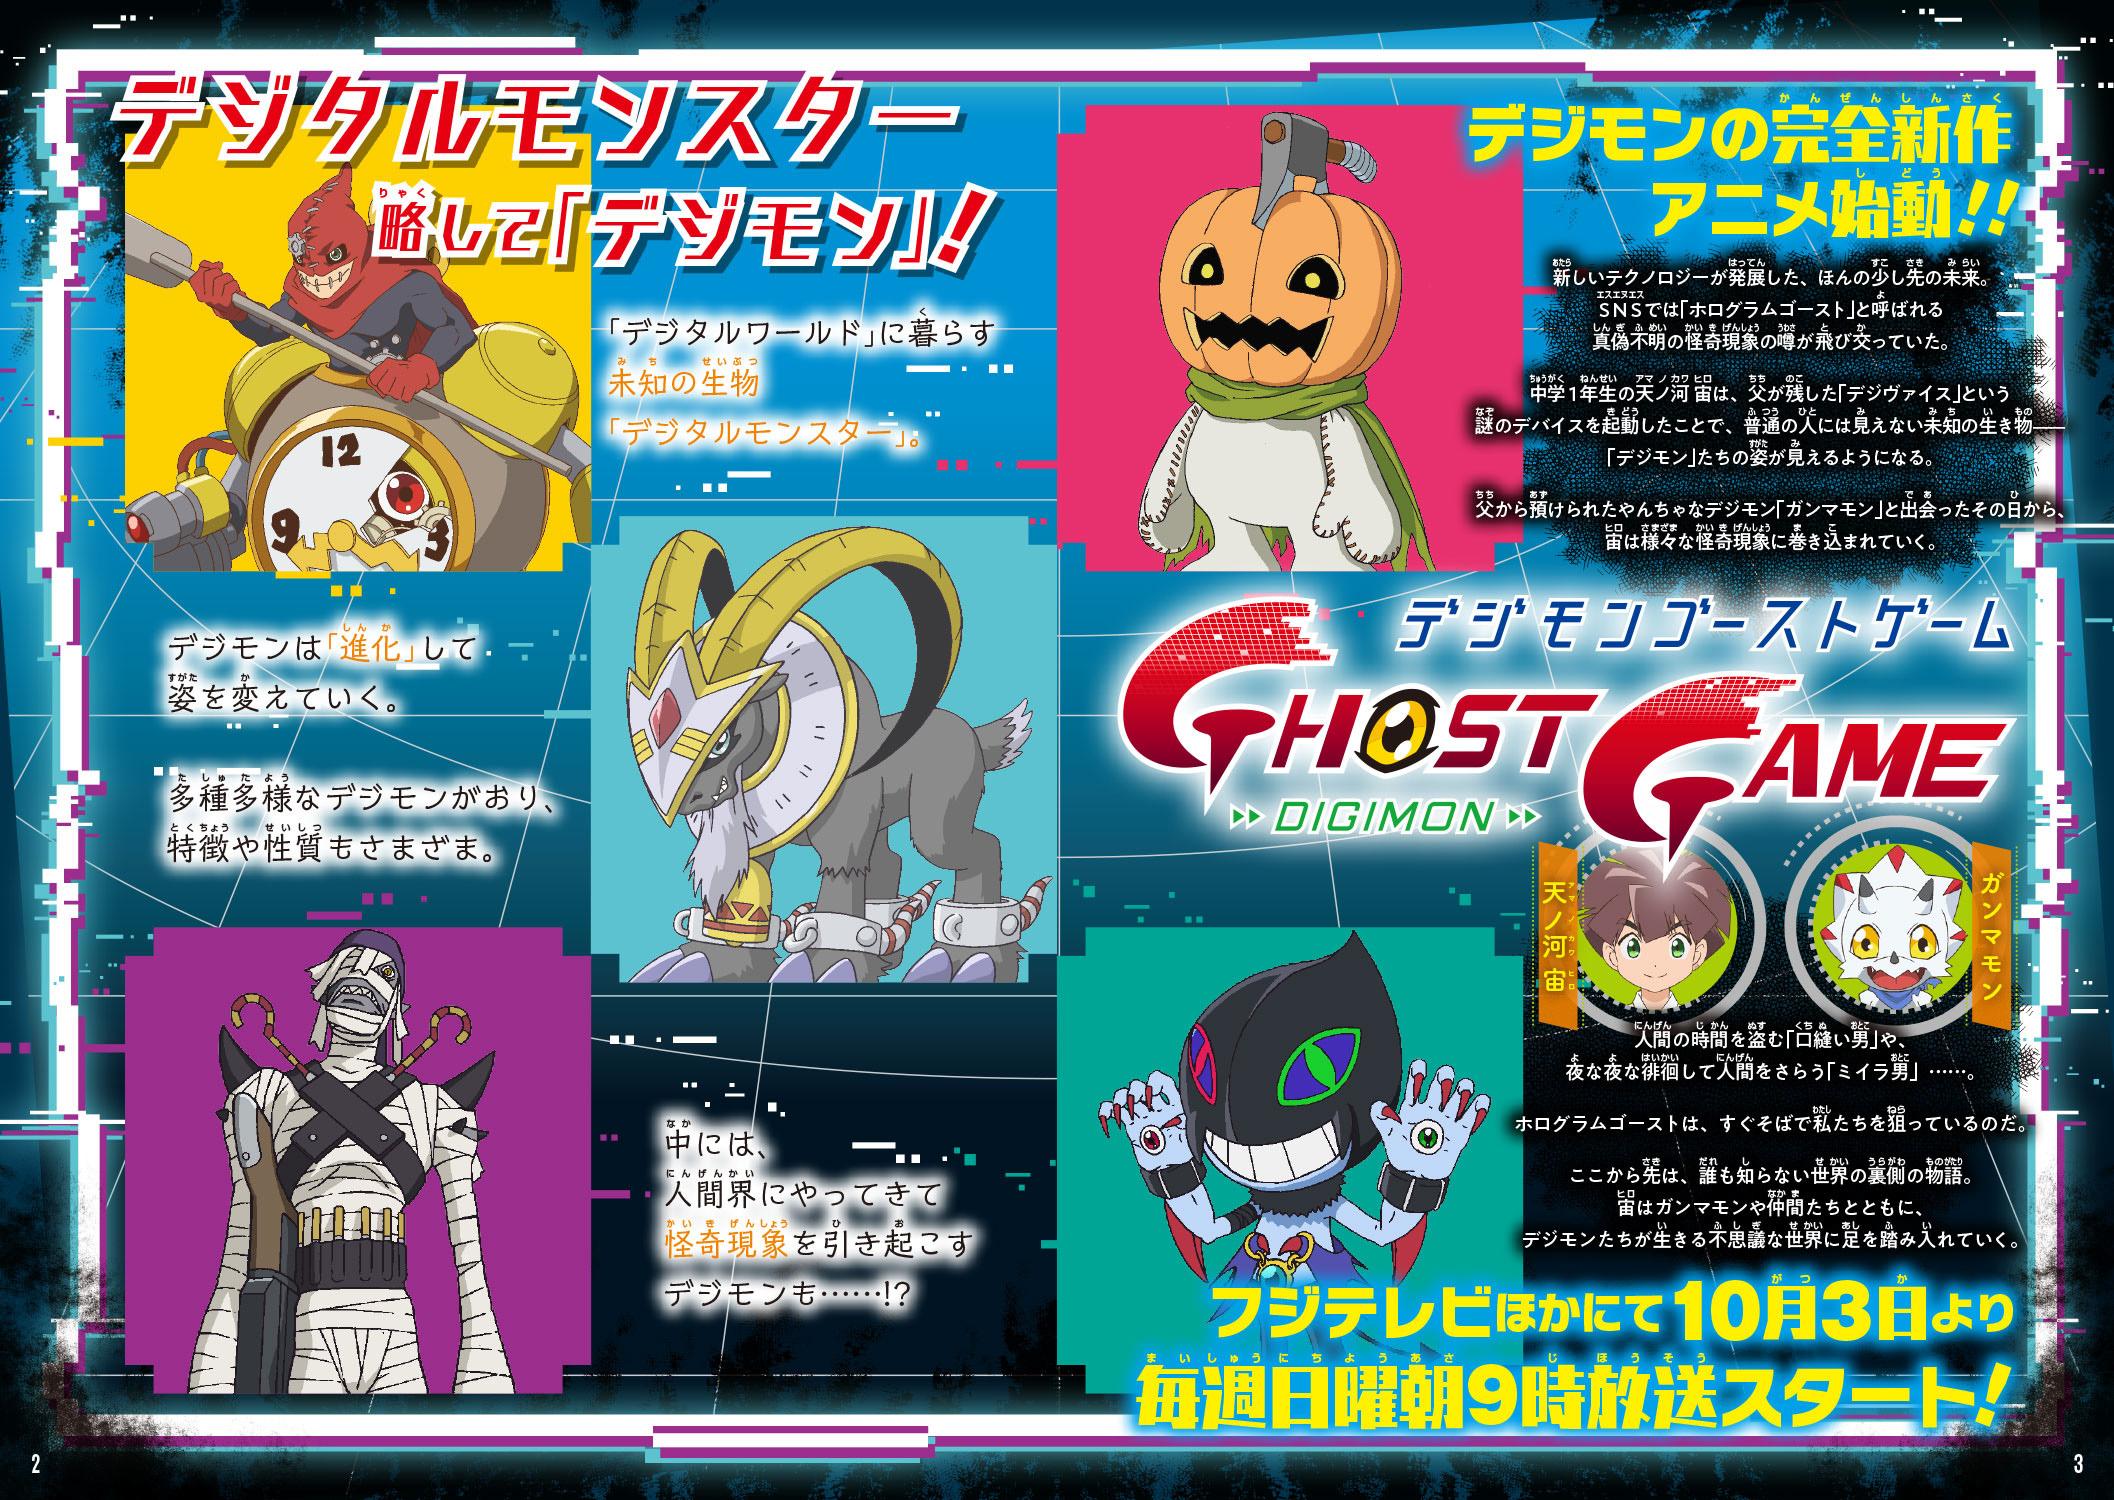 ghostgameguide02_september22_2021.jpg